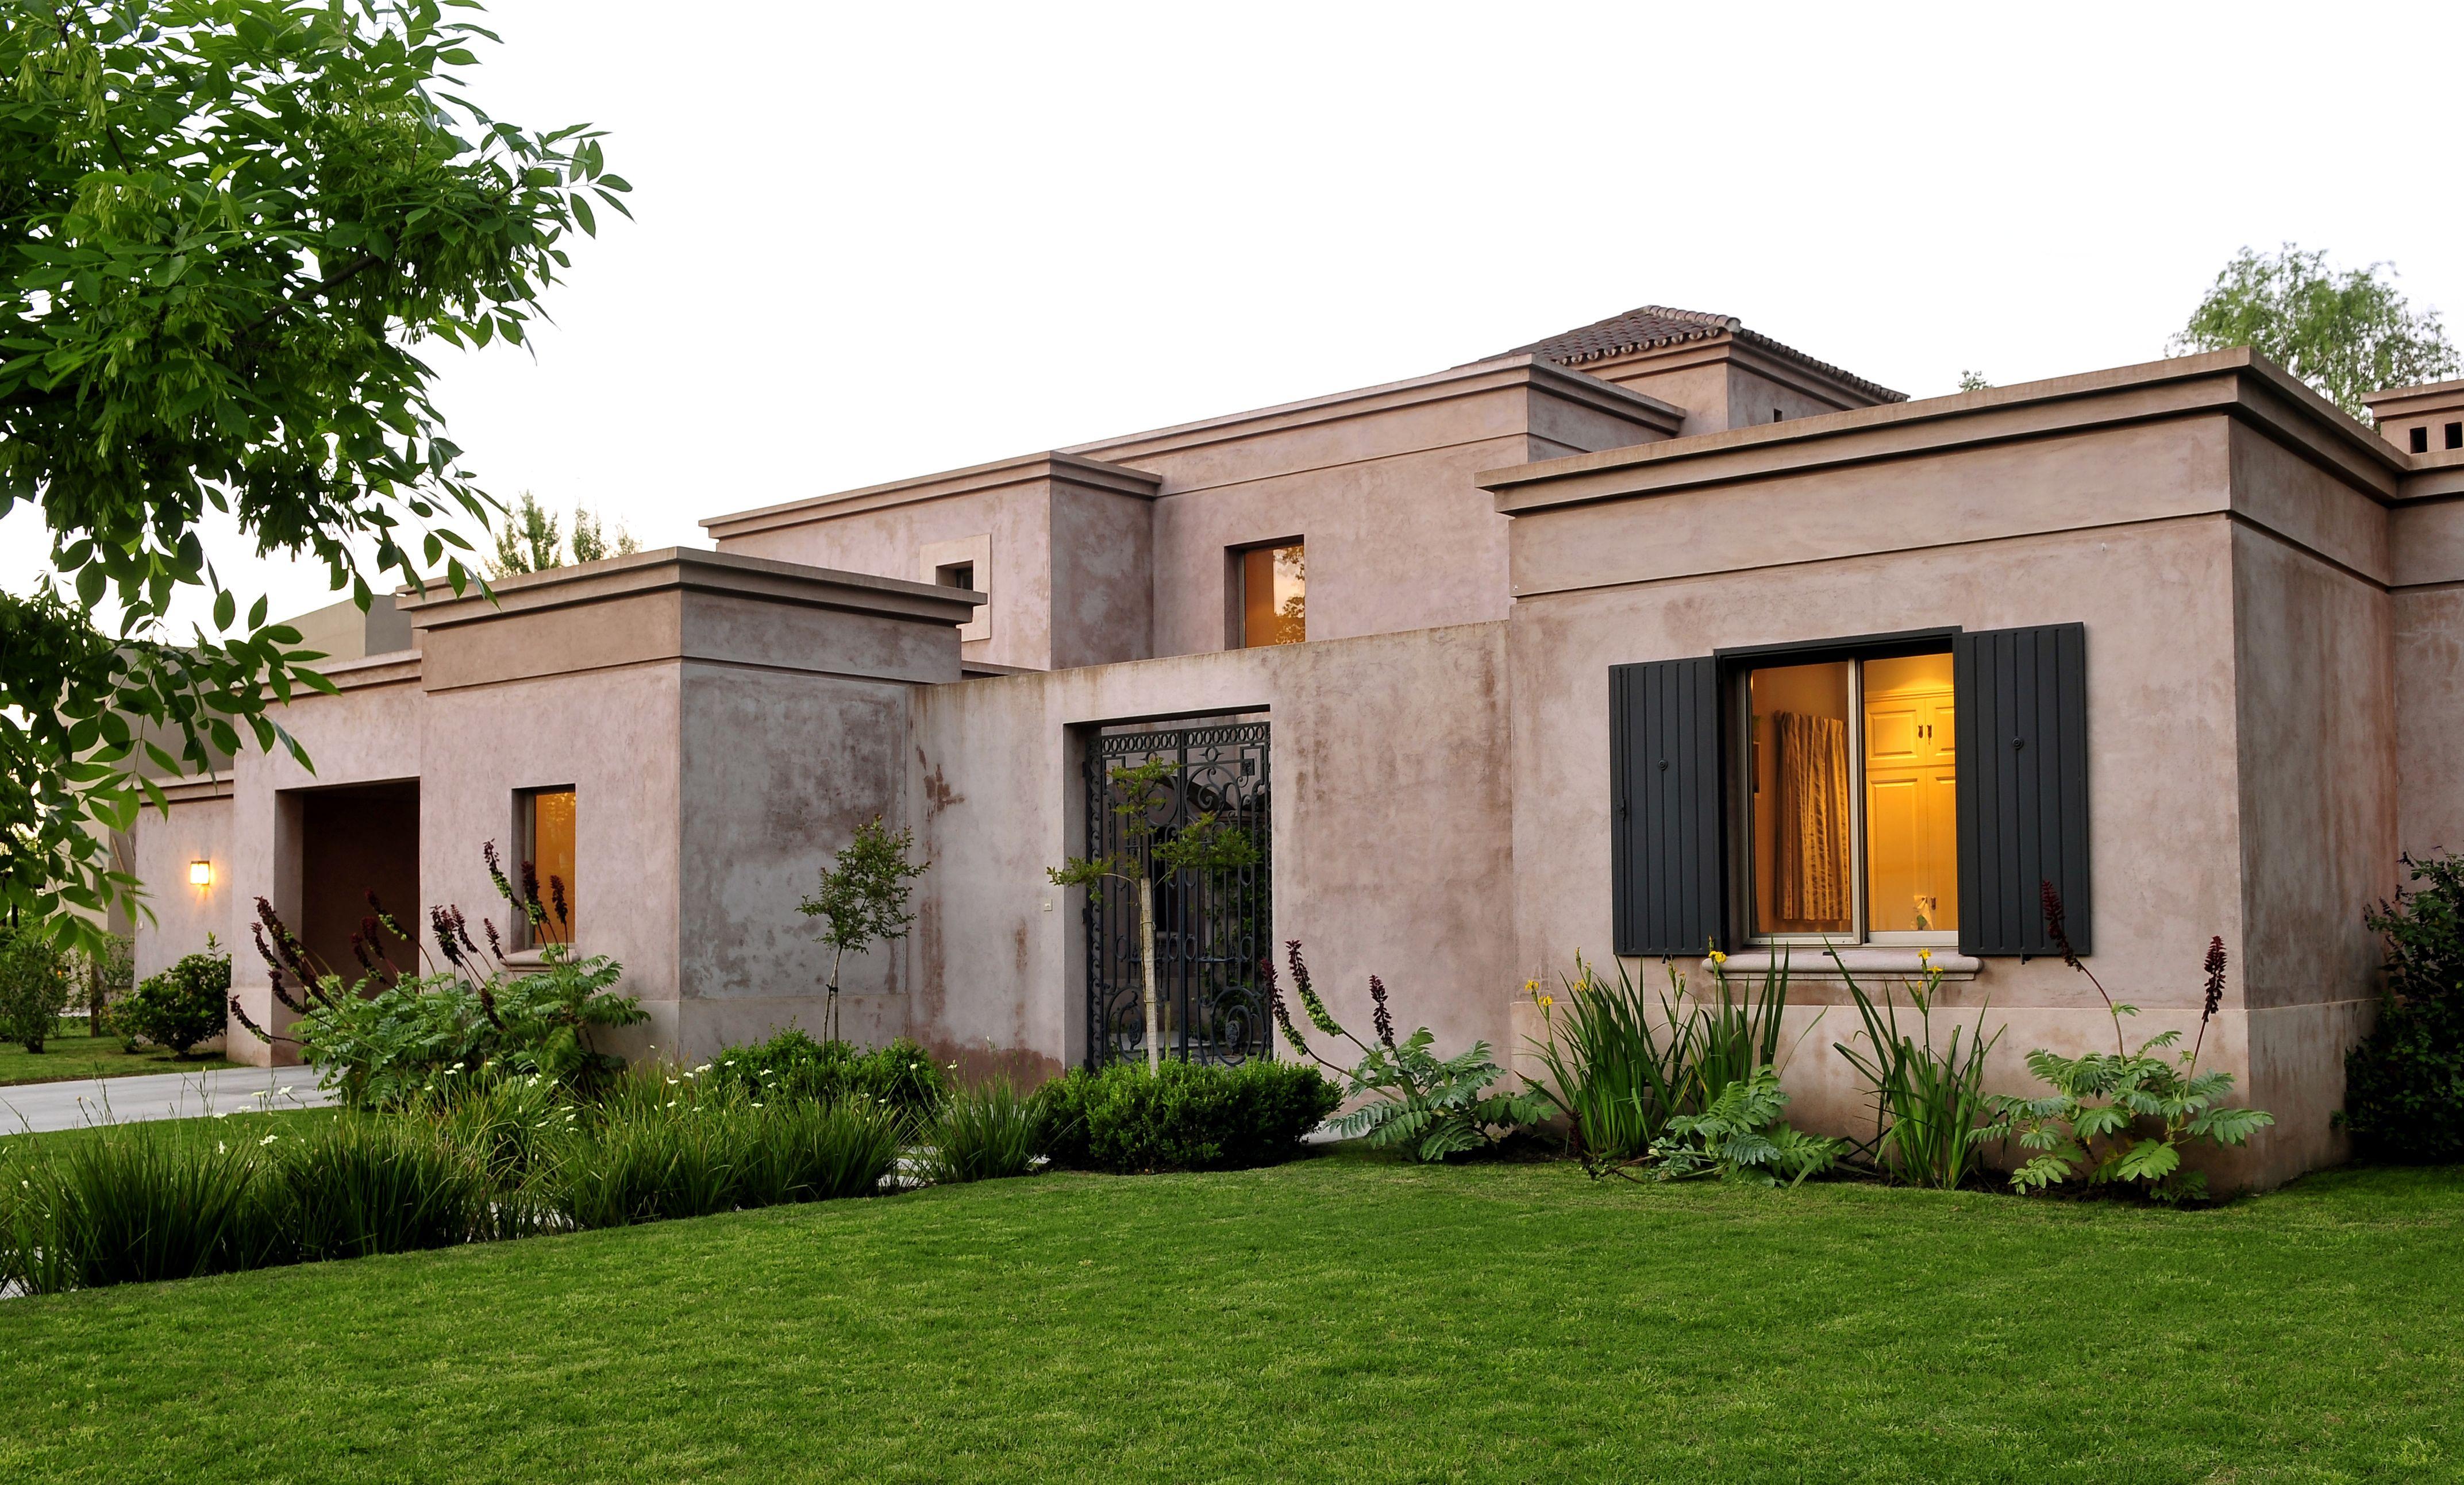 Arquitectura paisajismo ricardo pereyra iraola for Fachadas de casas nuevas modernas